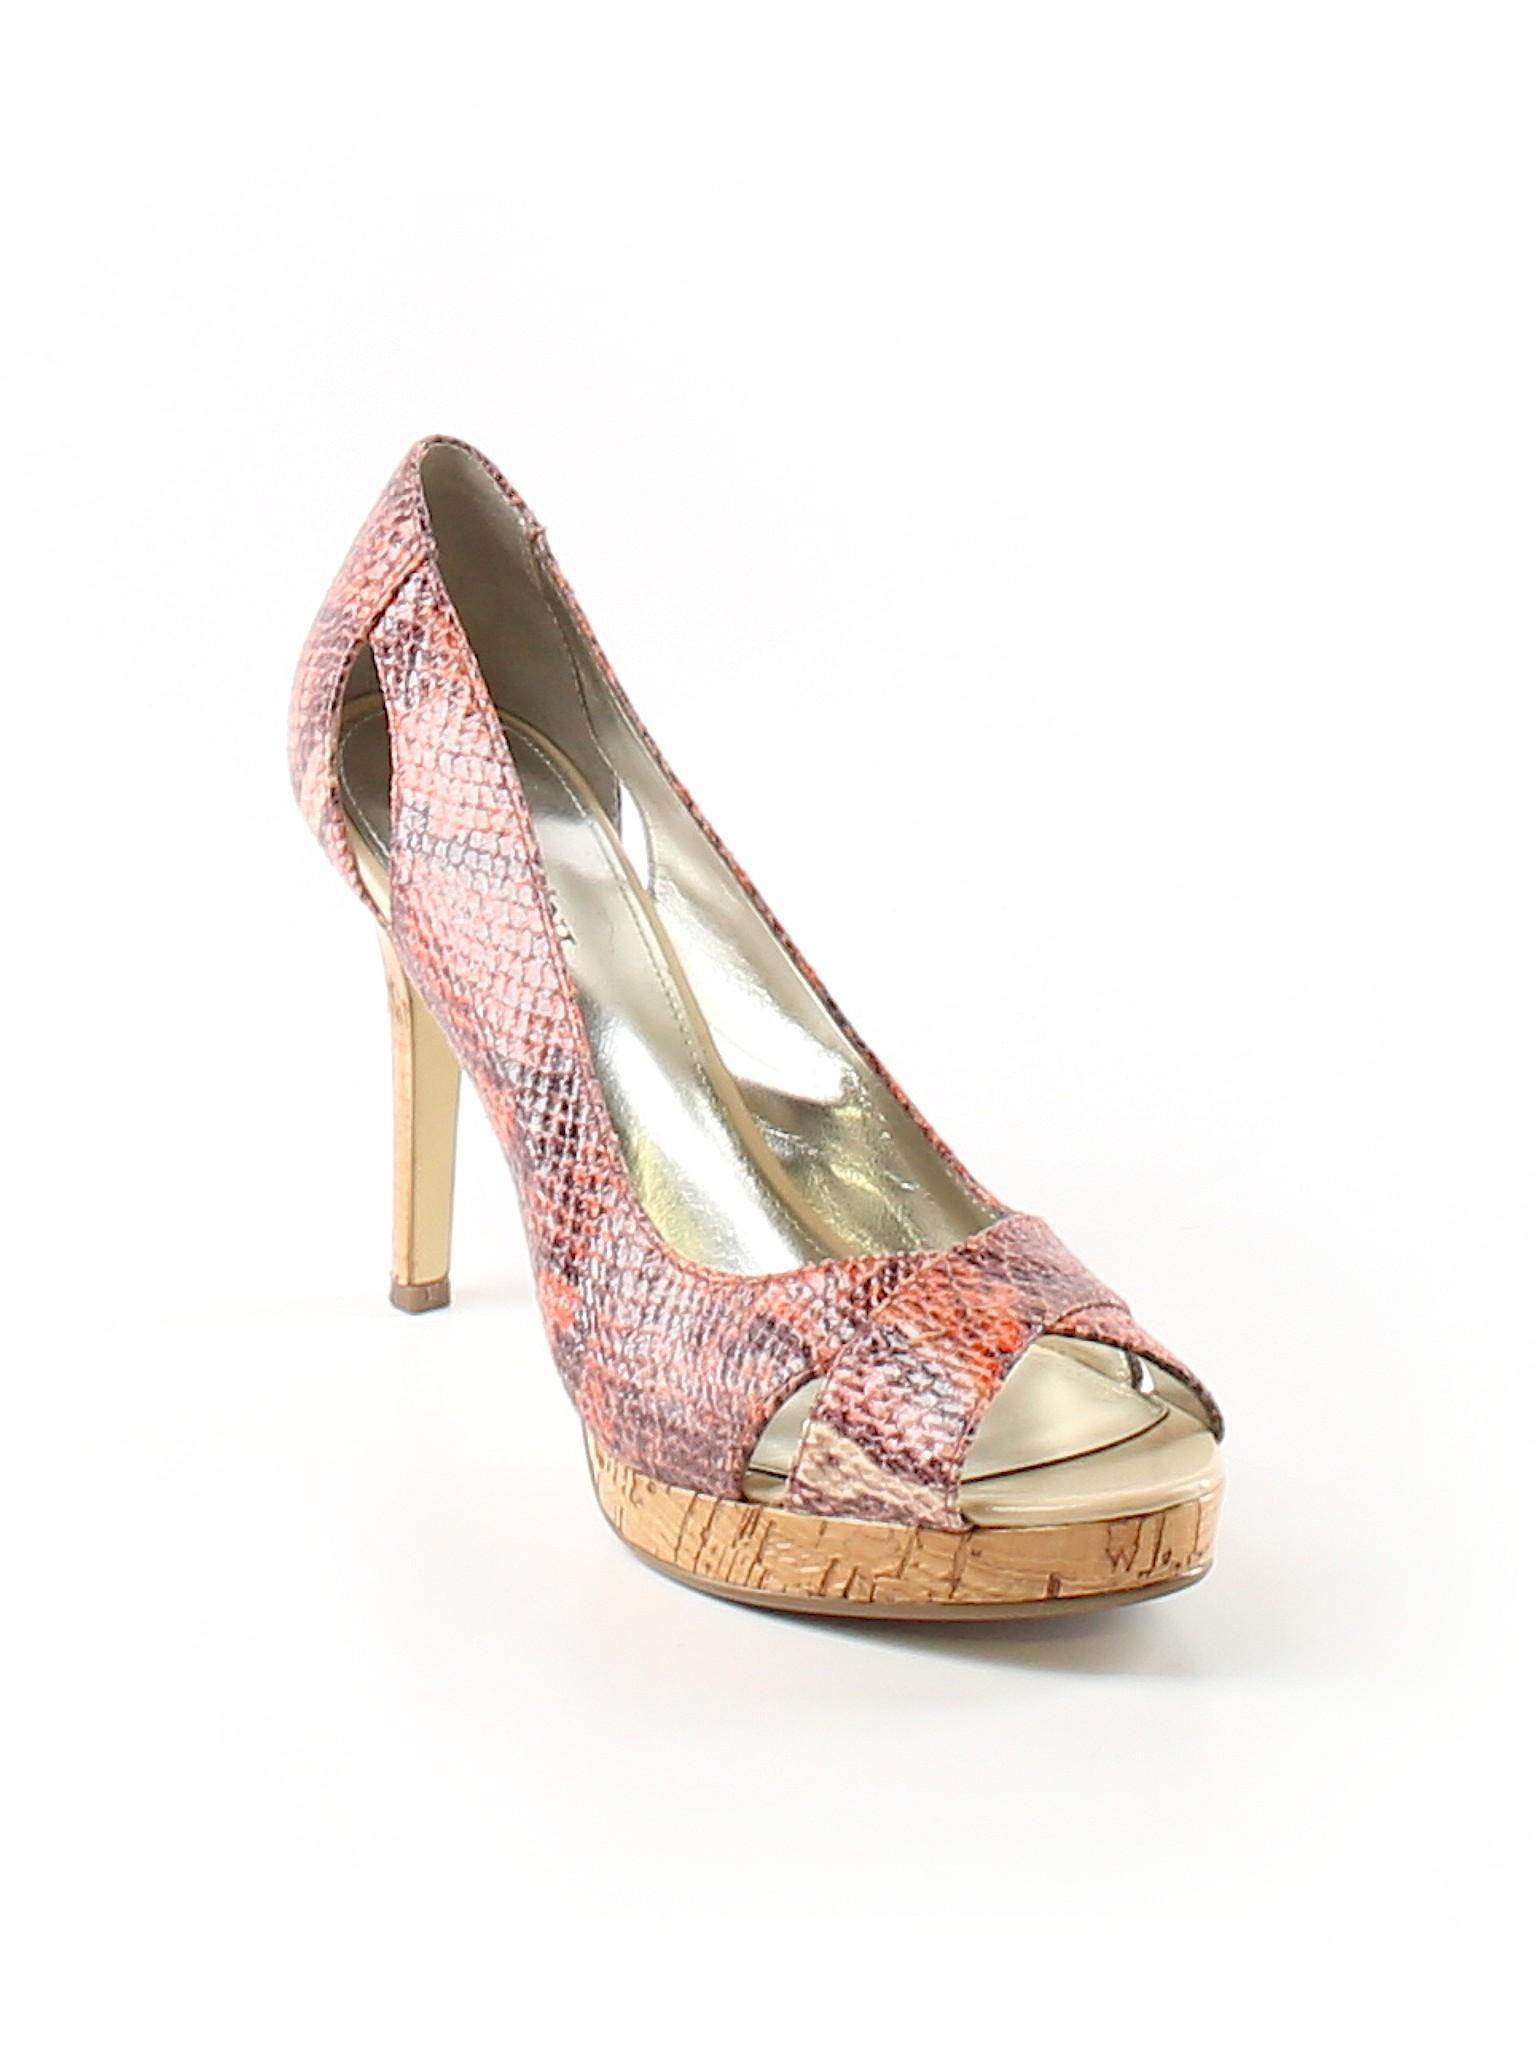 Alfani Alfani promotion Heels Boutique Boutique promotion IwxdOtqxg